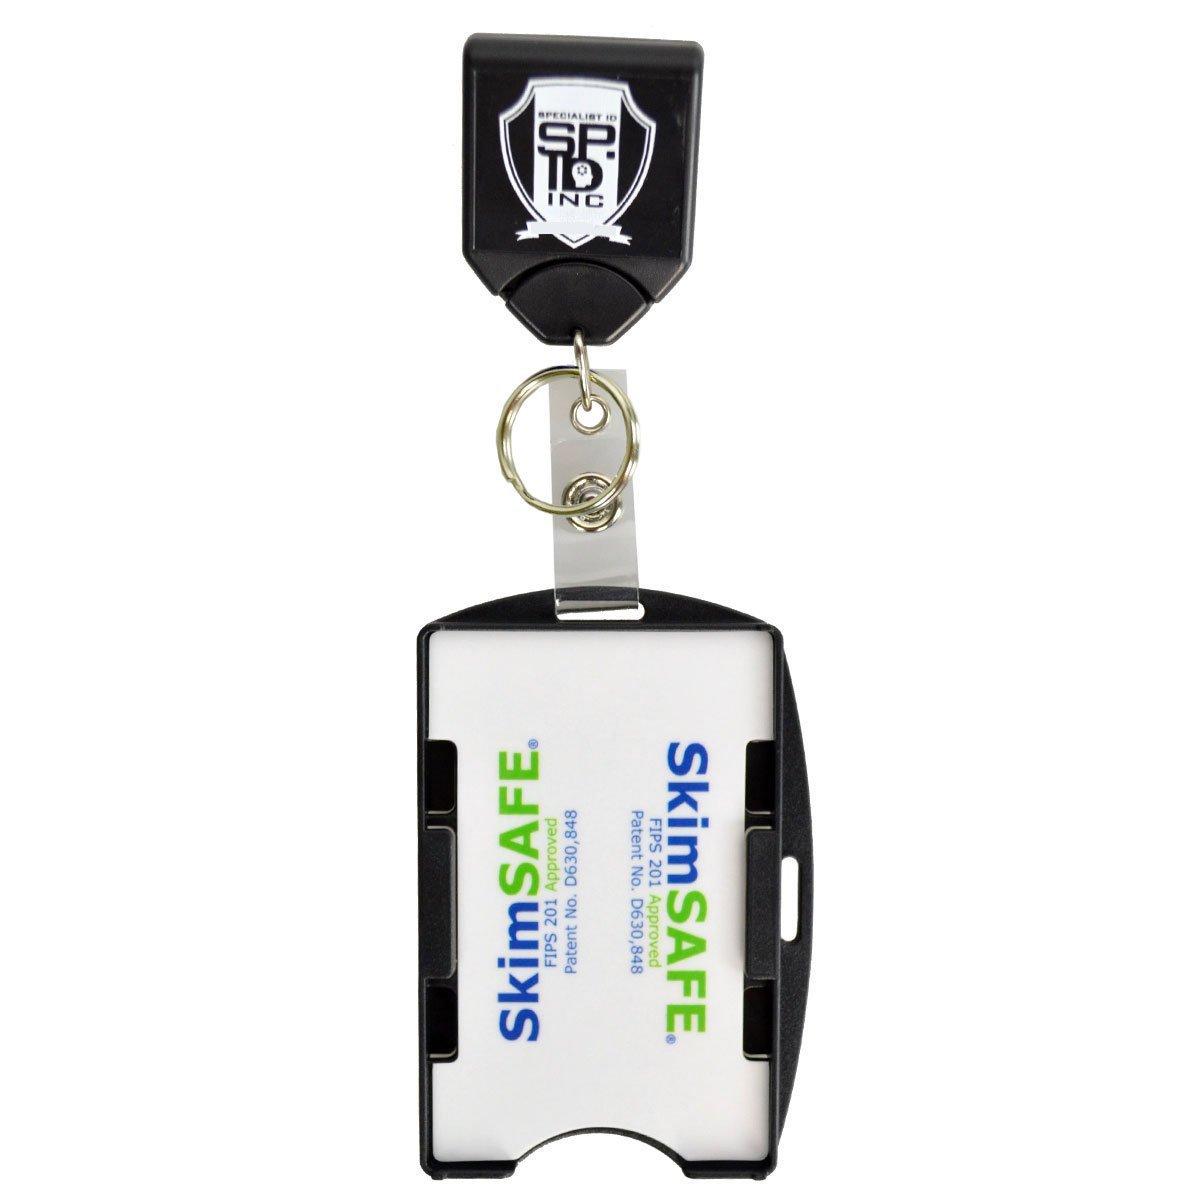 Heavy Duty Black Badge Reel w/Key Ring and Skimsafe 2-Card RFID Blocking Shielded ID Badge Holder by Specialist ID